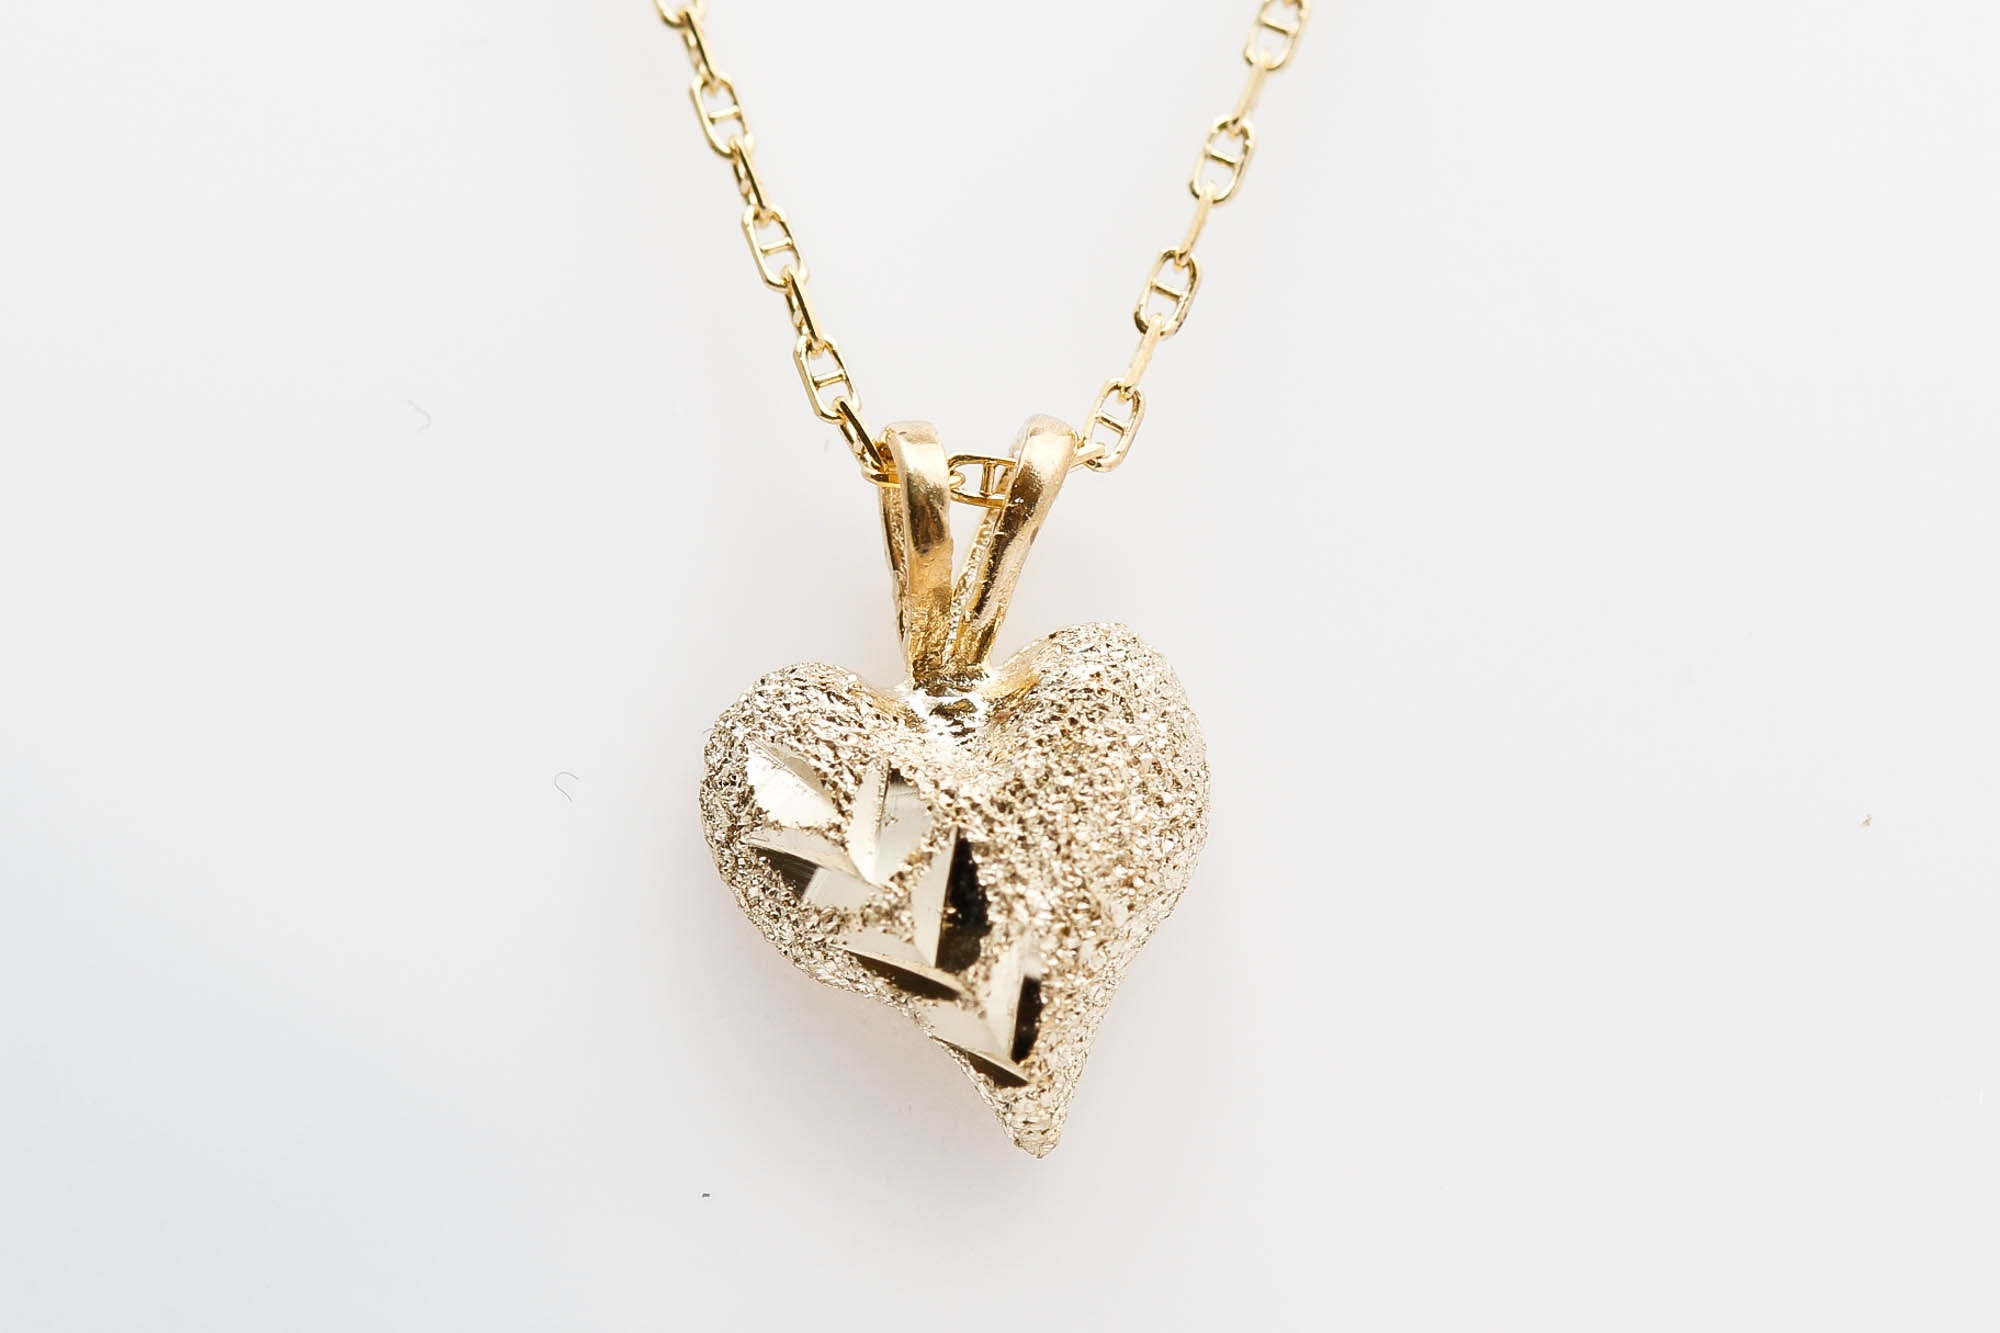 Aurafin 4 14K Yellow Gold Heart Pendant Necklace